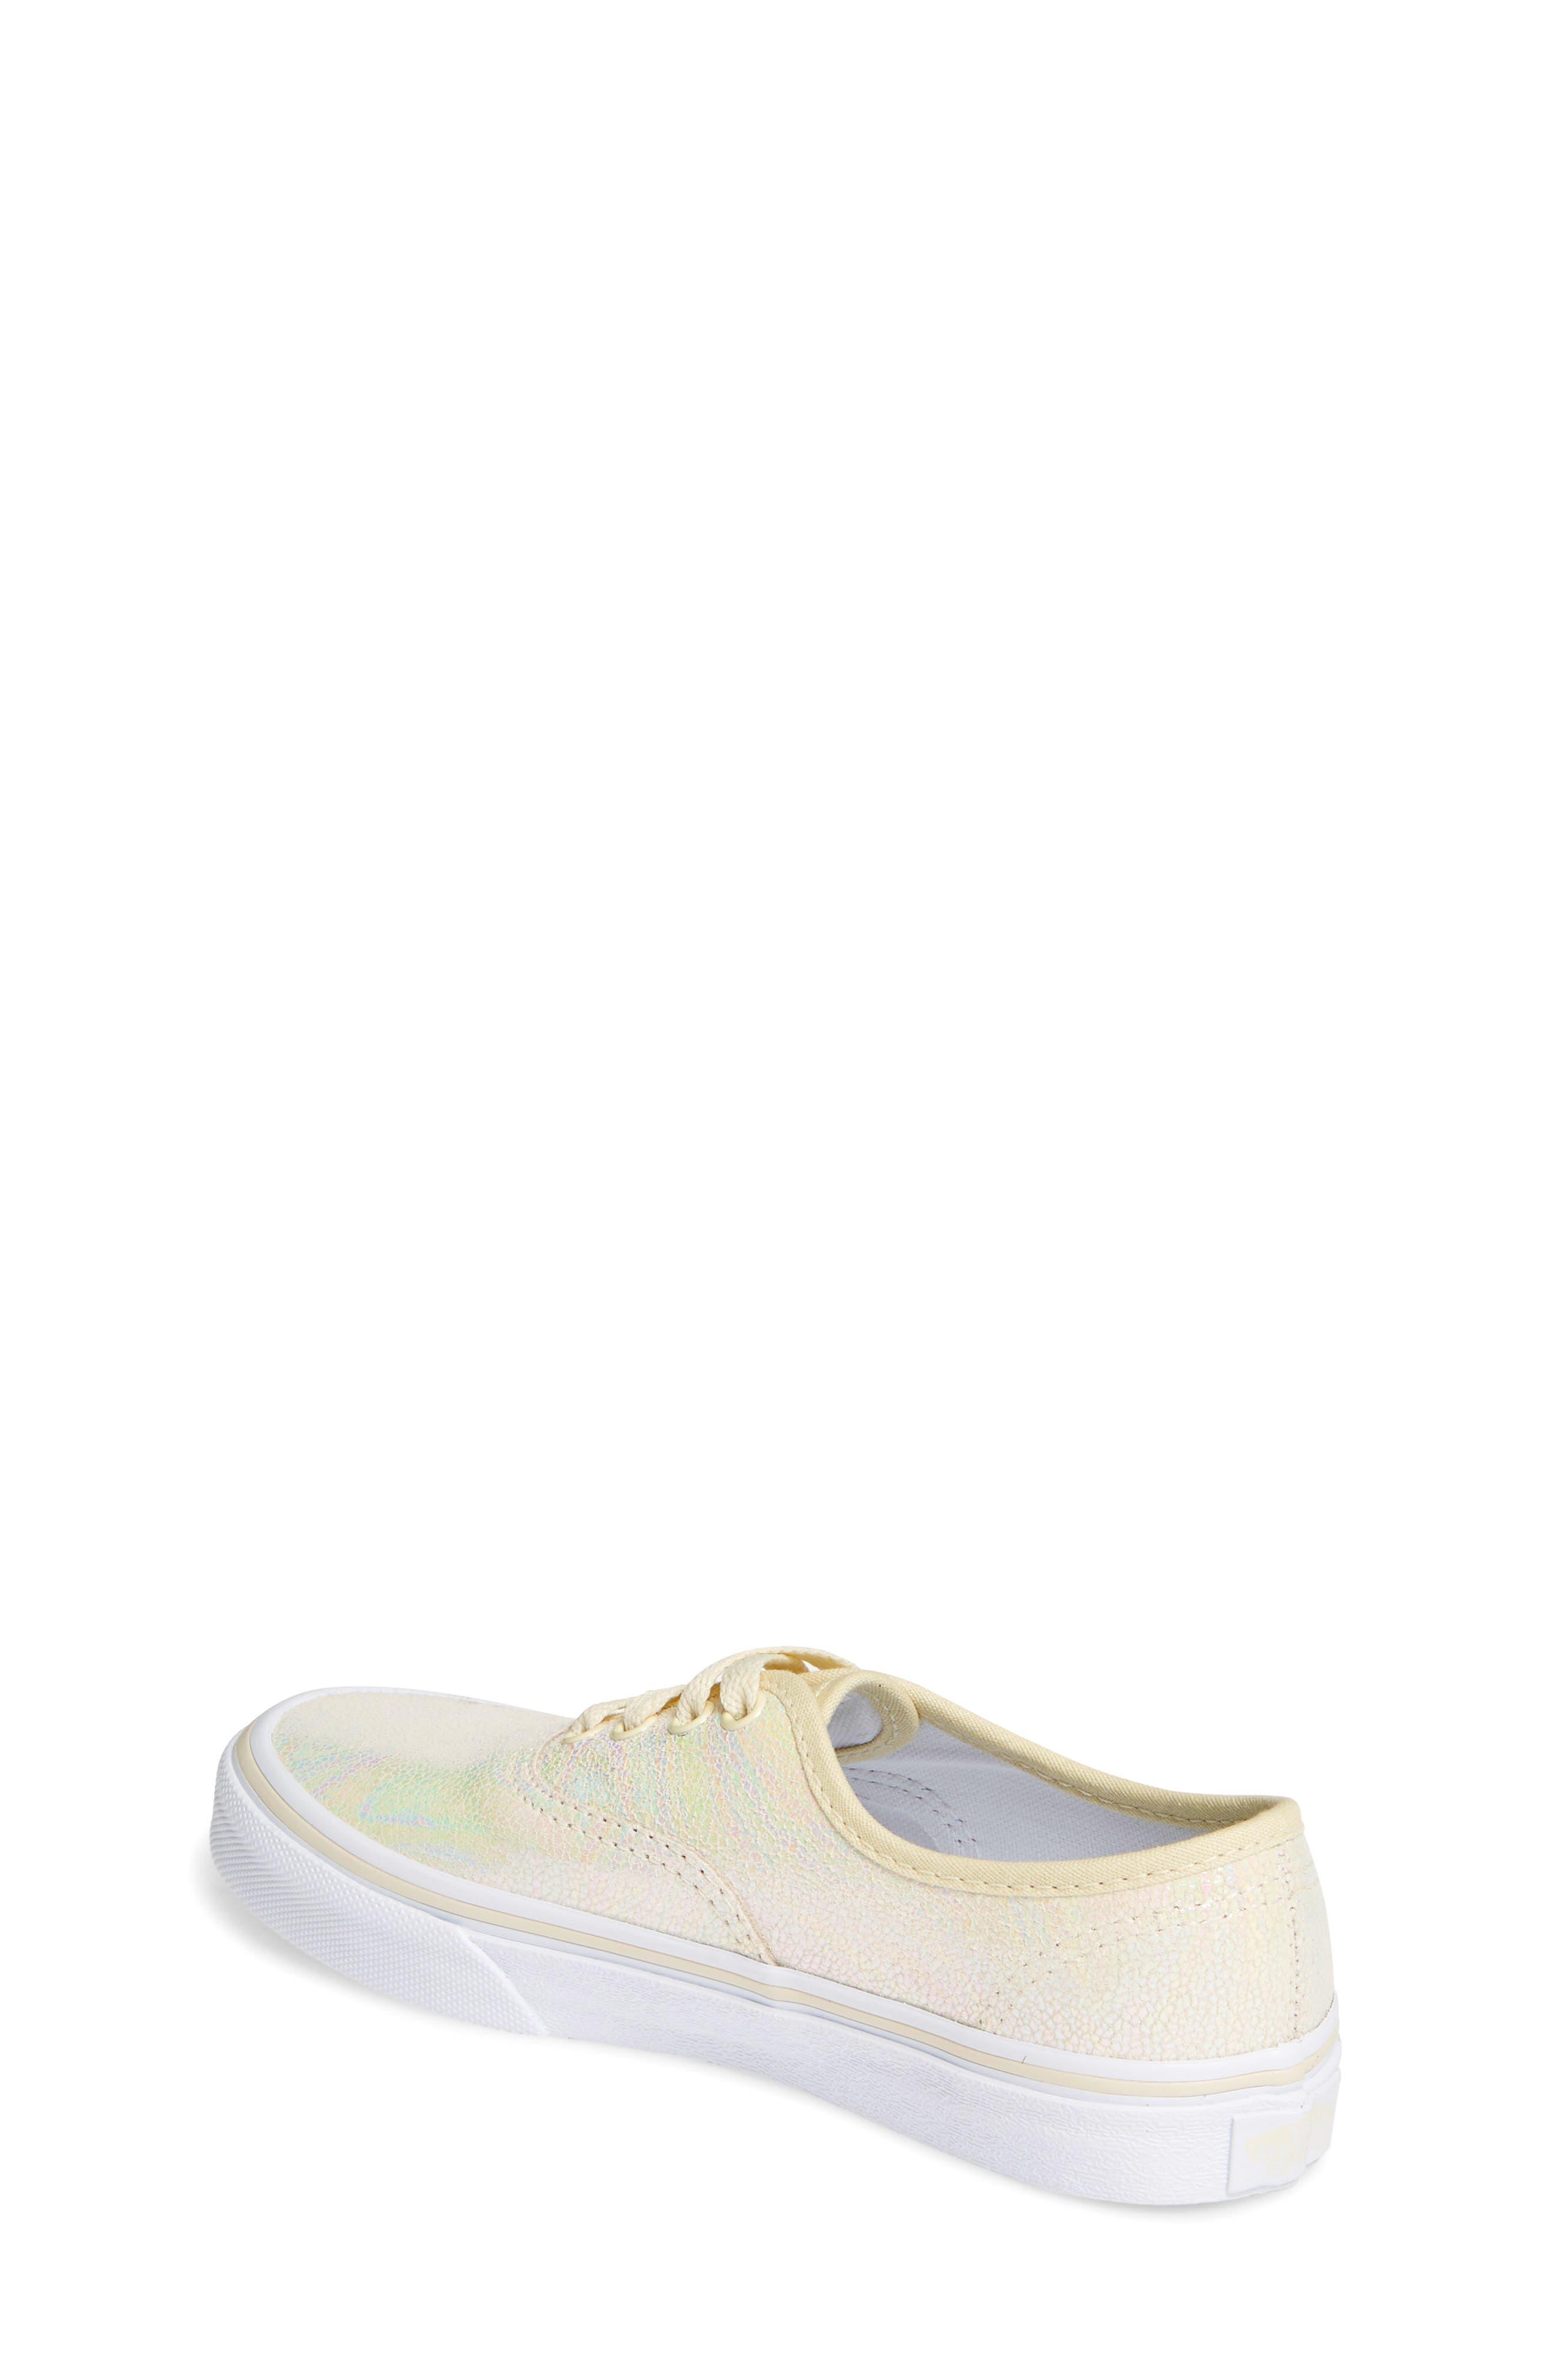 407c84ec51d36d glitter sneakers